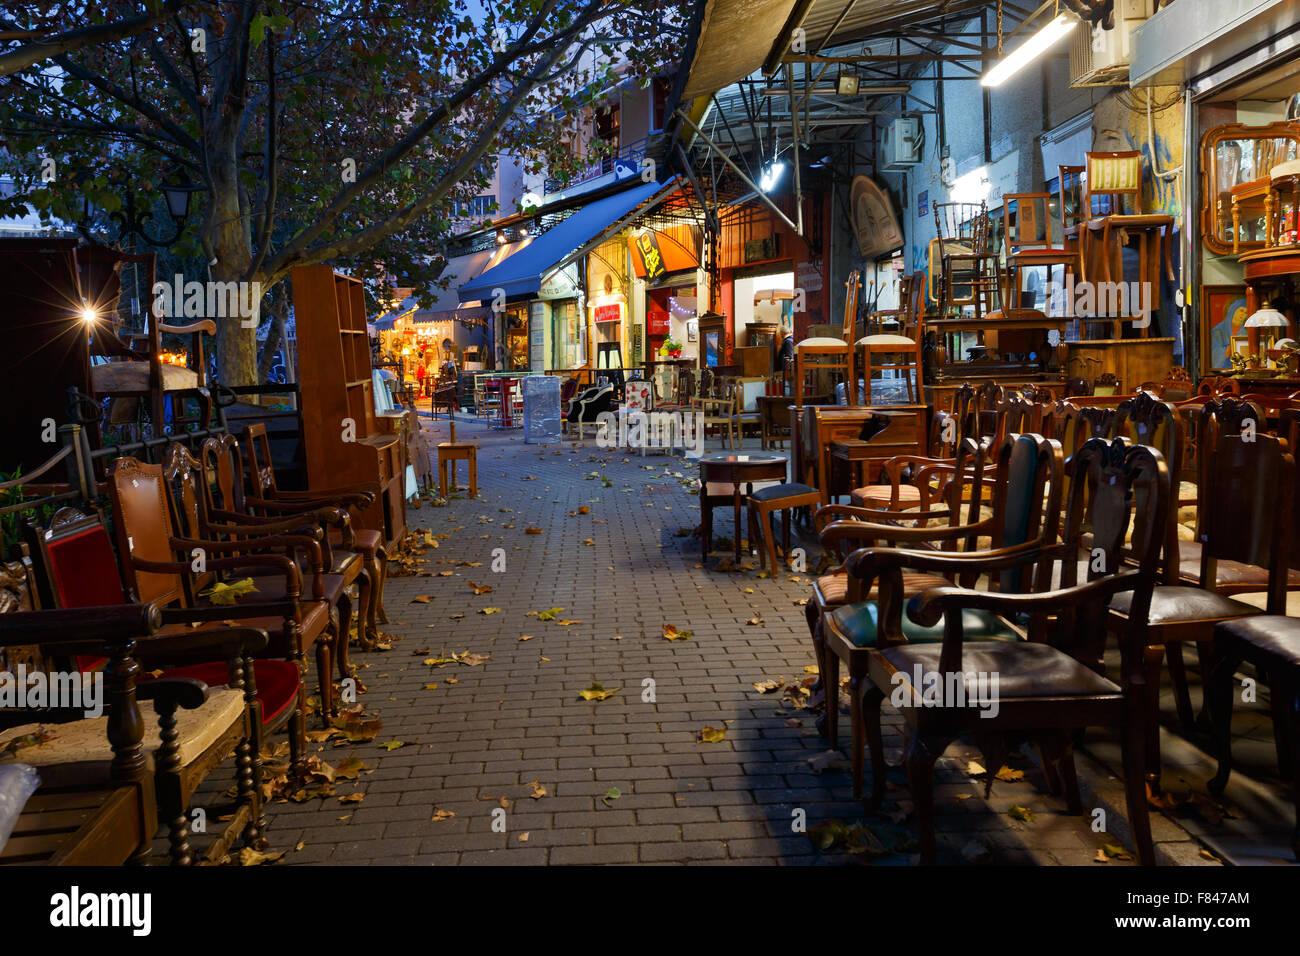 Antique furniture shop in the flea market in the Monastiraki area in Plaka,  Athens - Antique Furniture Shop In The Flea Market In The Monastiraki Area